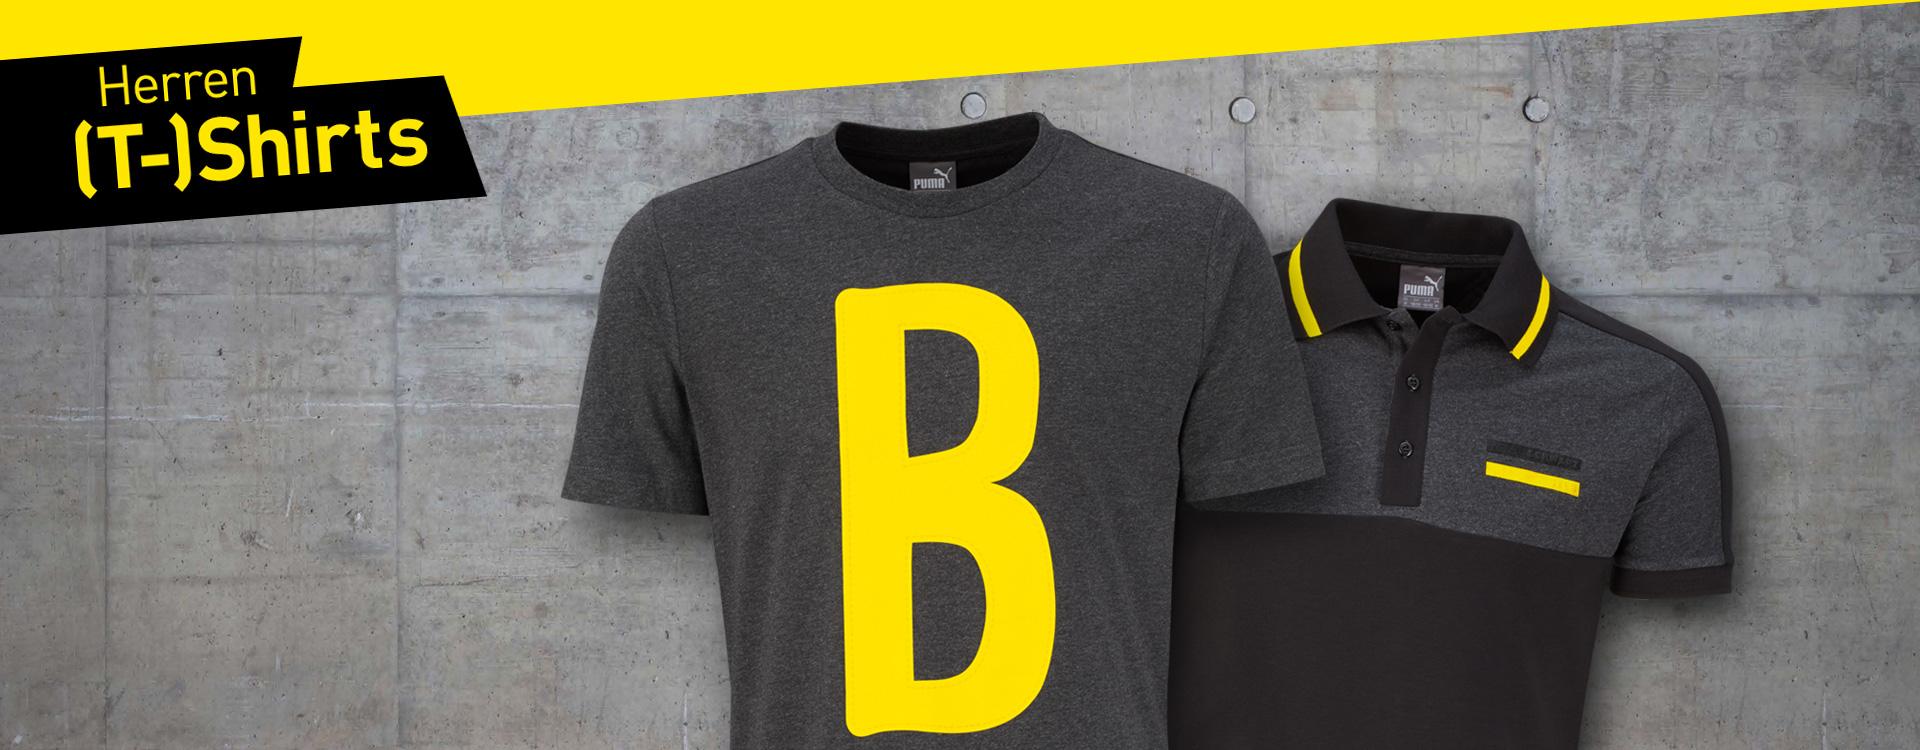 Kategorie-Herren-Shirts